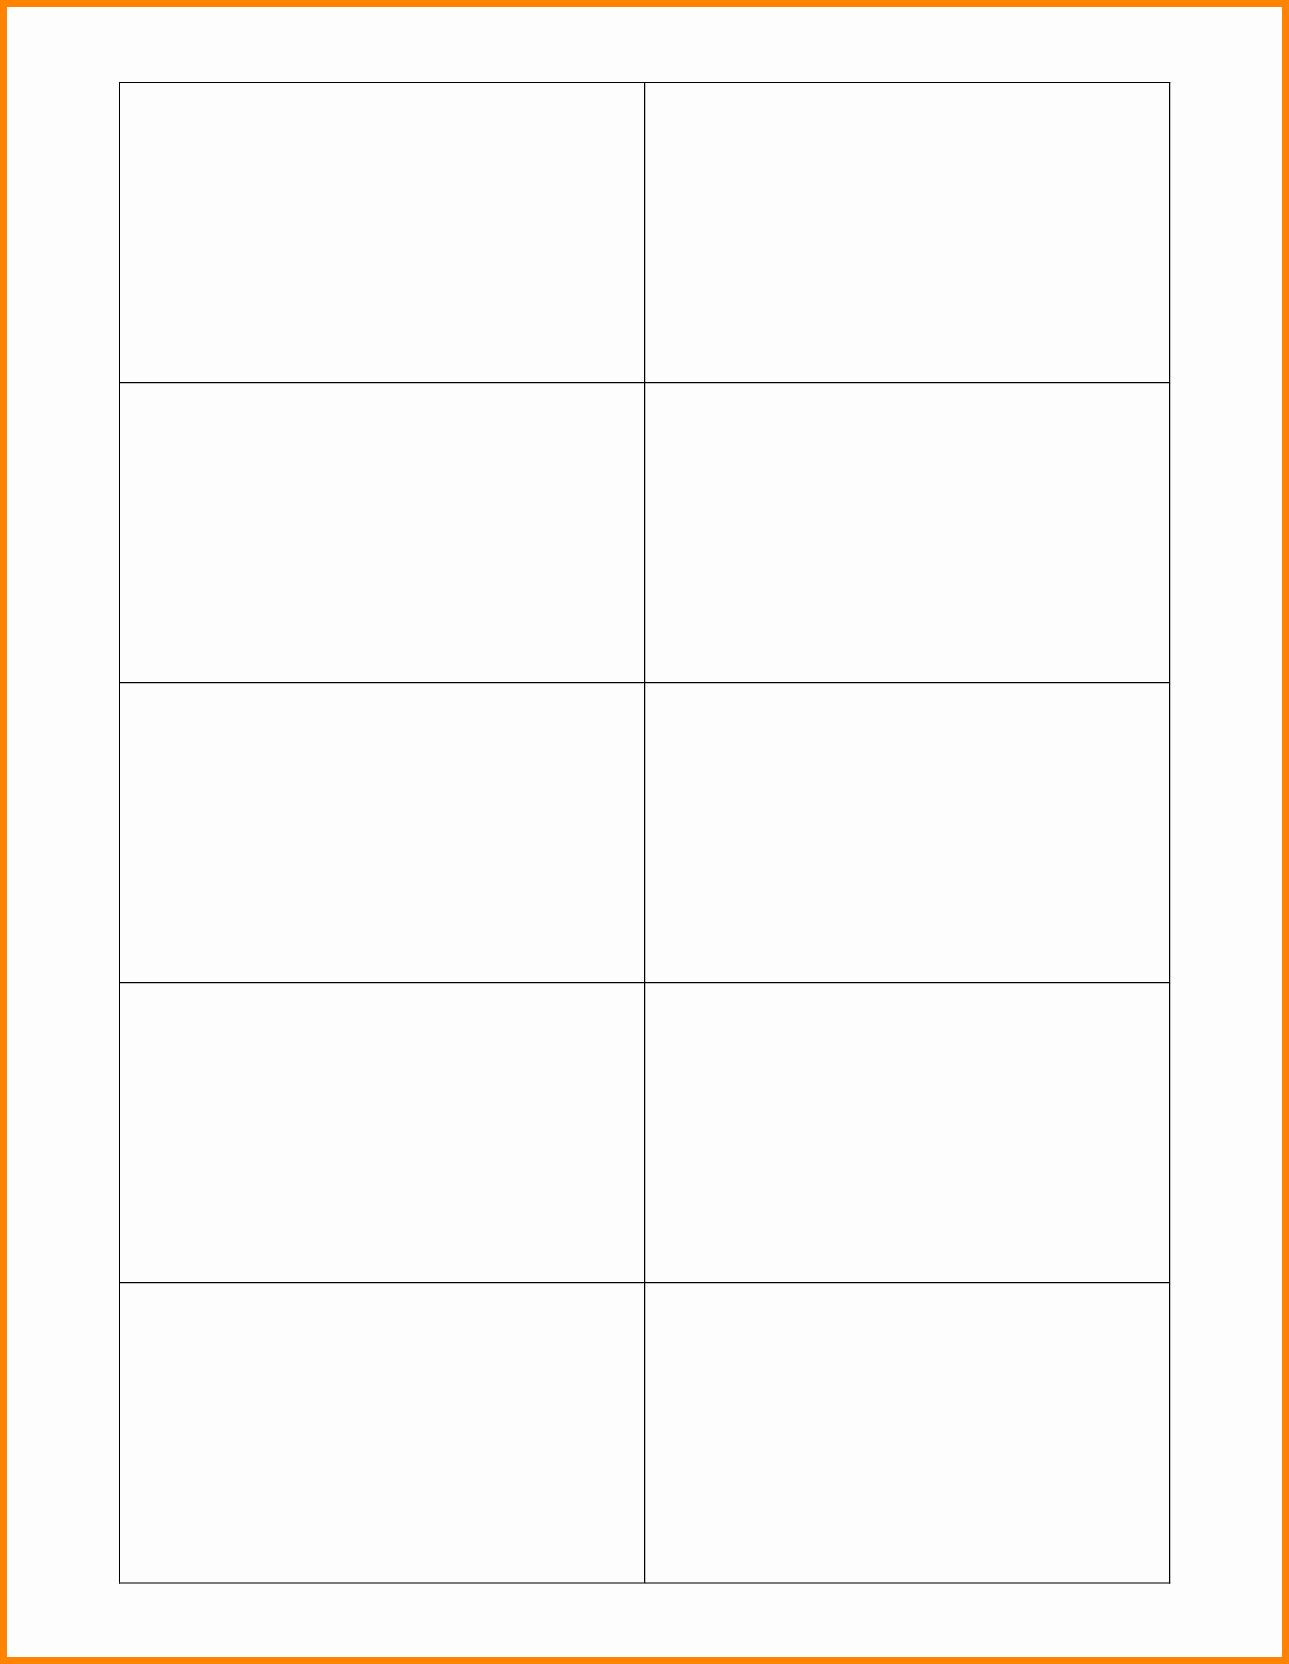 blank business card template word blank business card template word 0 2